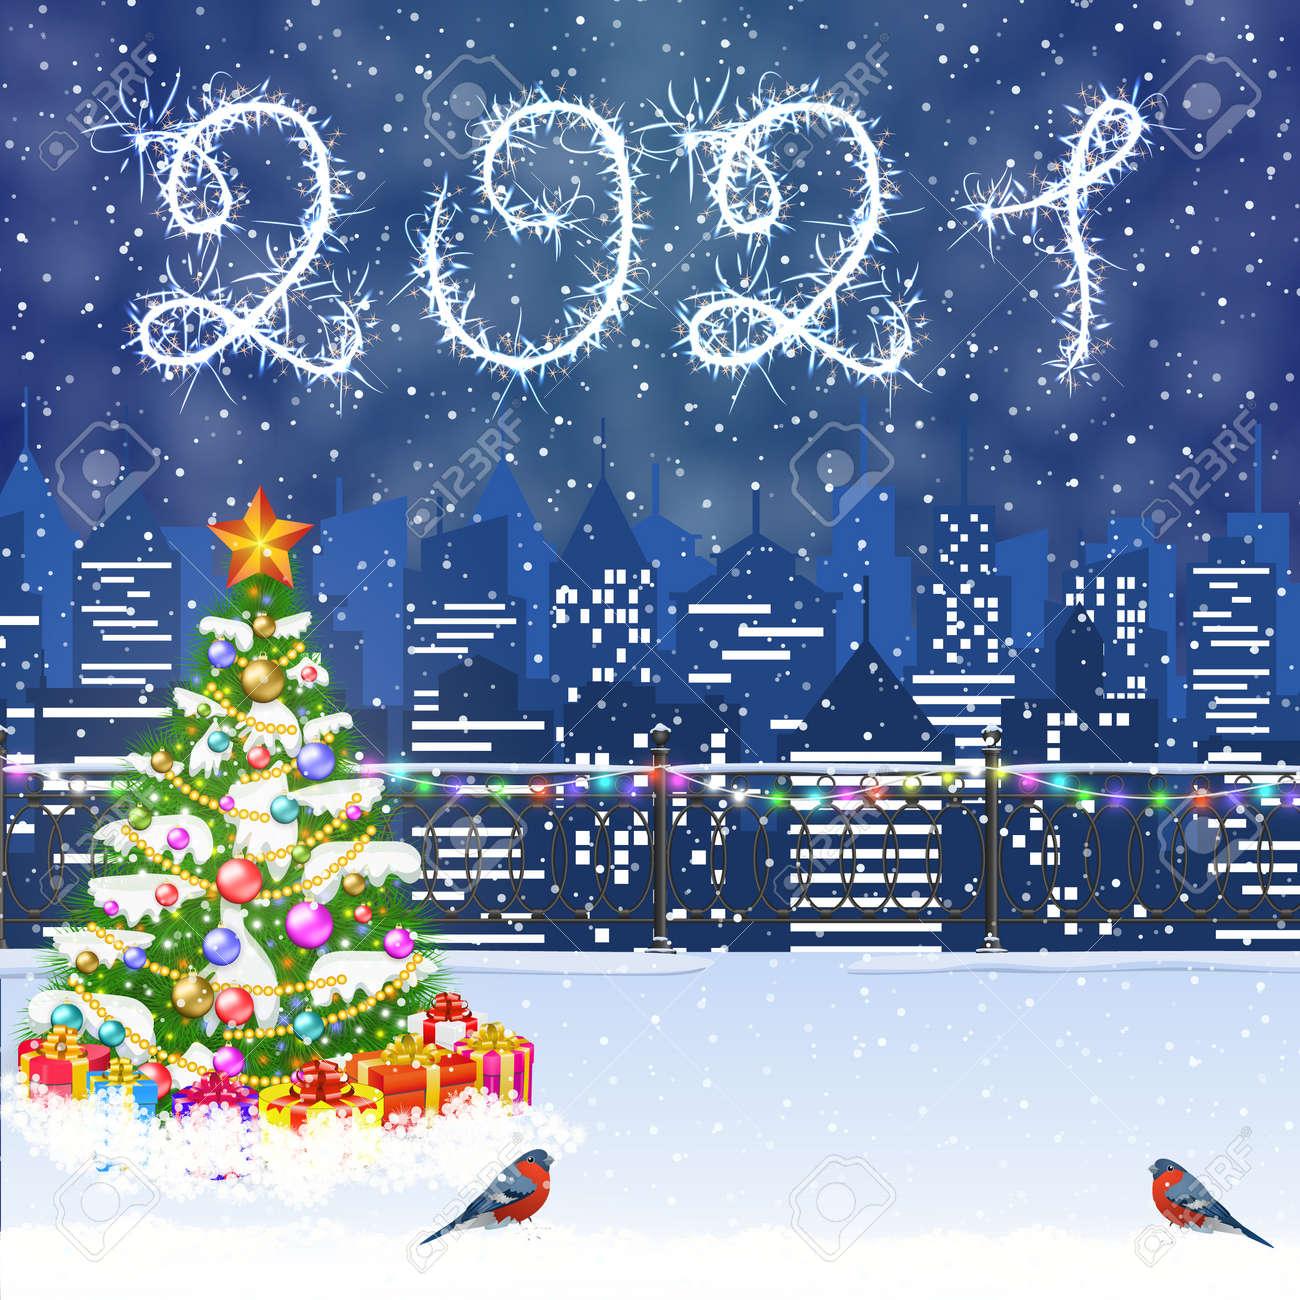 Christmas Winter Cityscape - 157074751